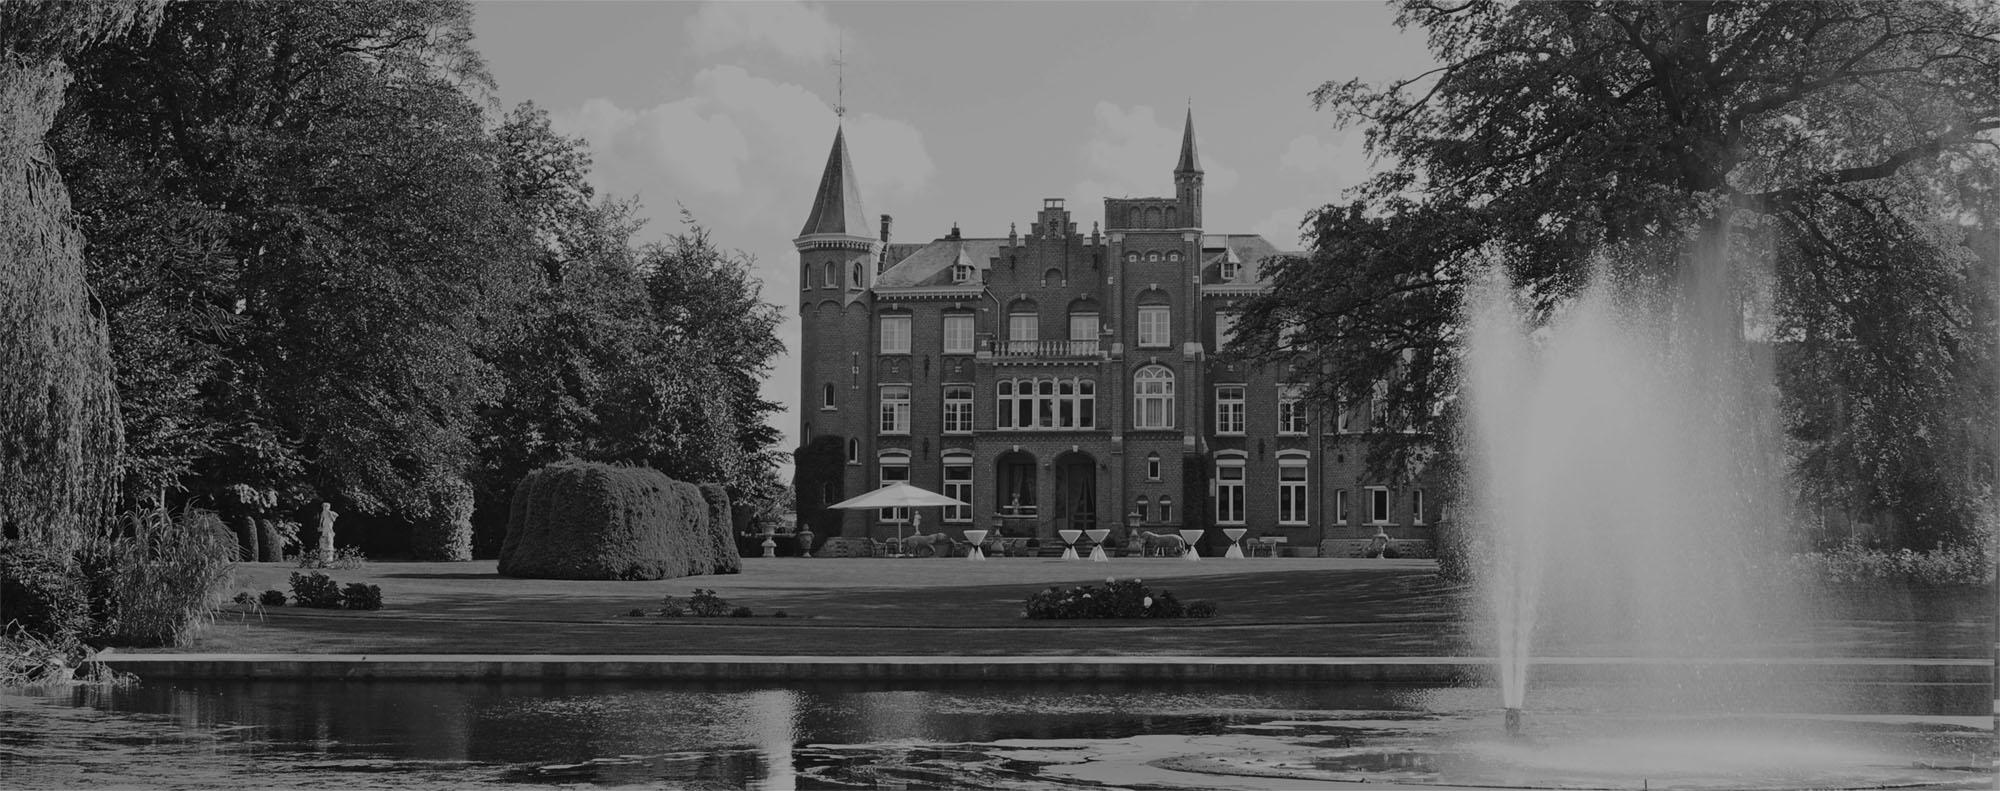 Brugge - Hotel - Hotel Lodewijk Van Male